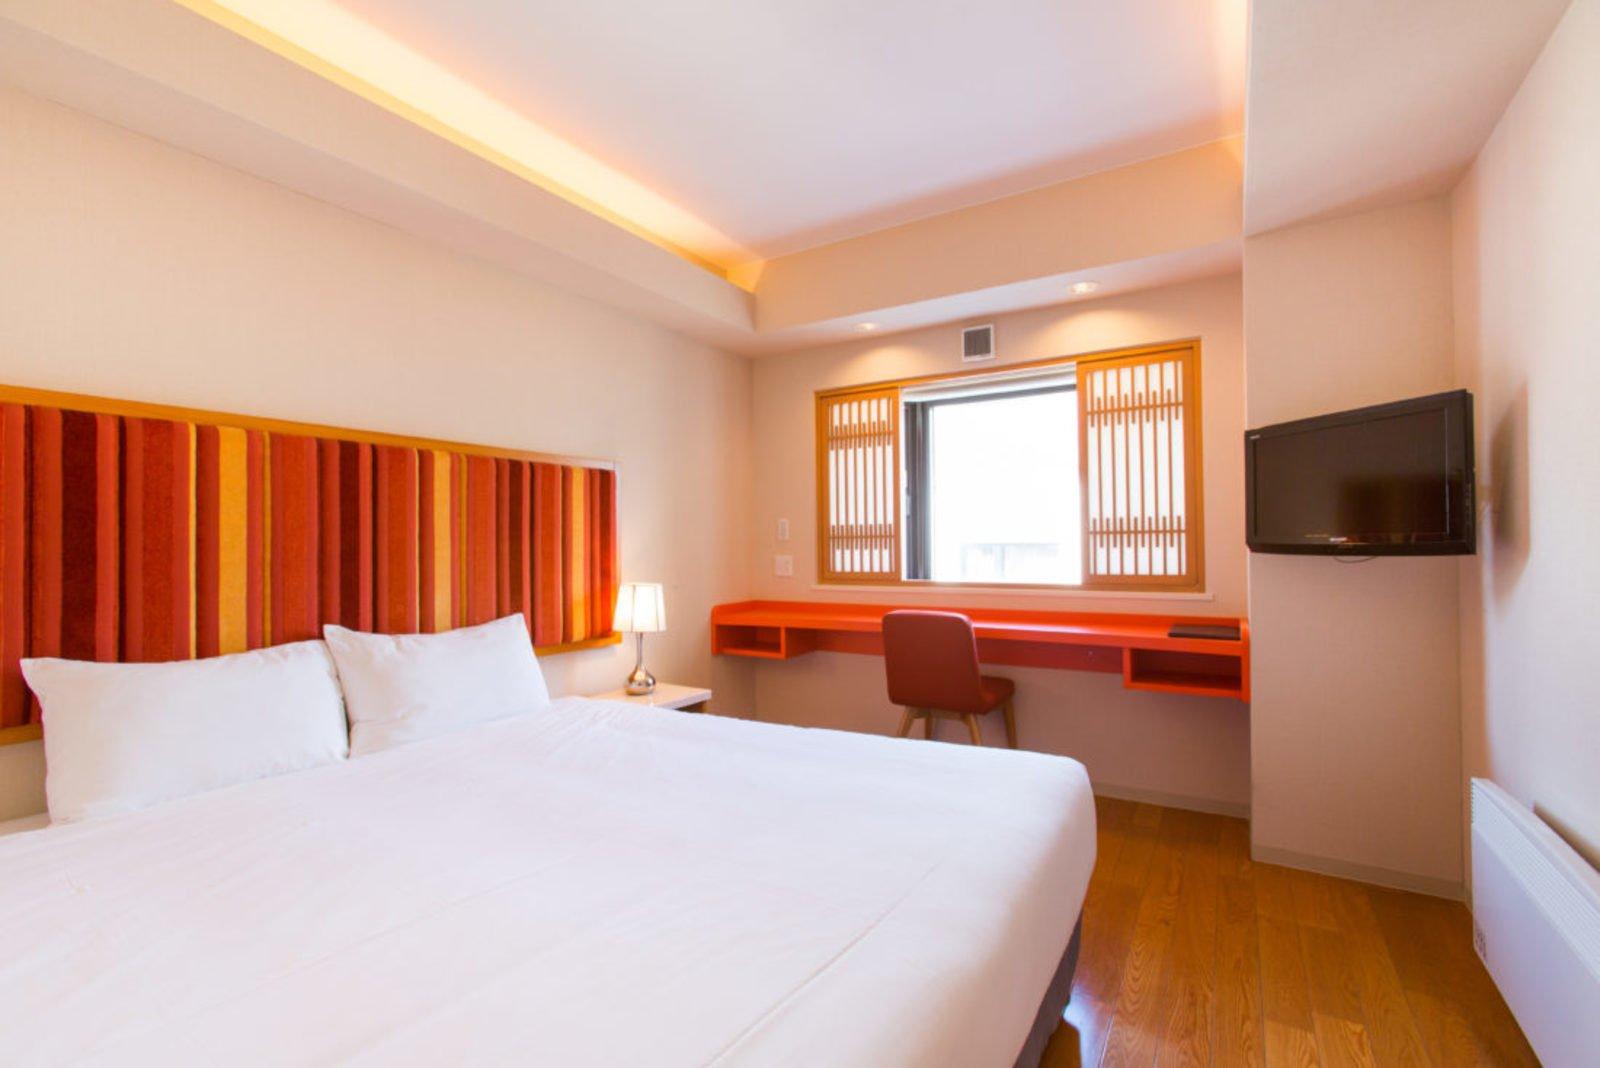 M hotel standard room large